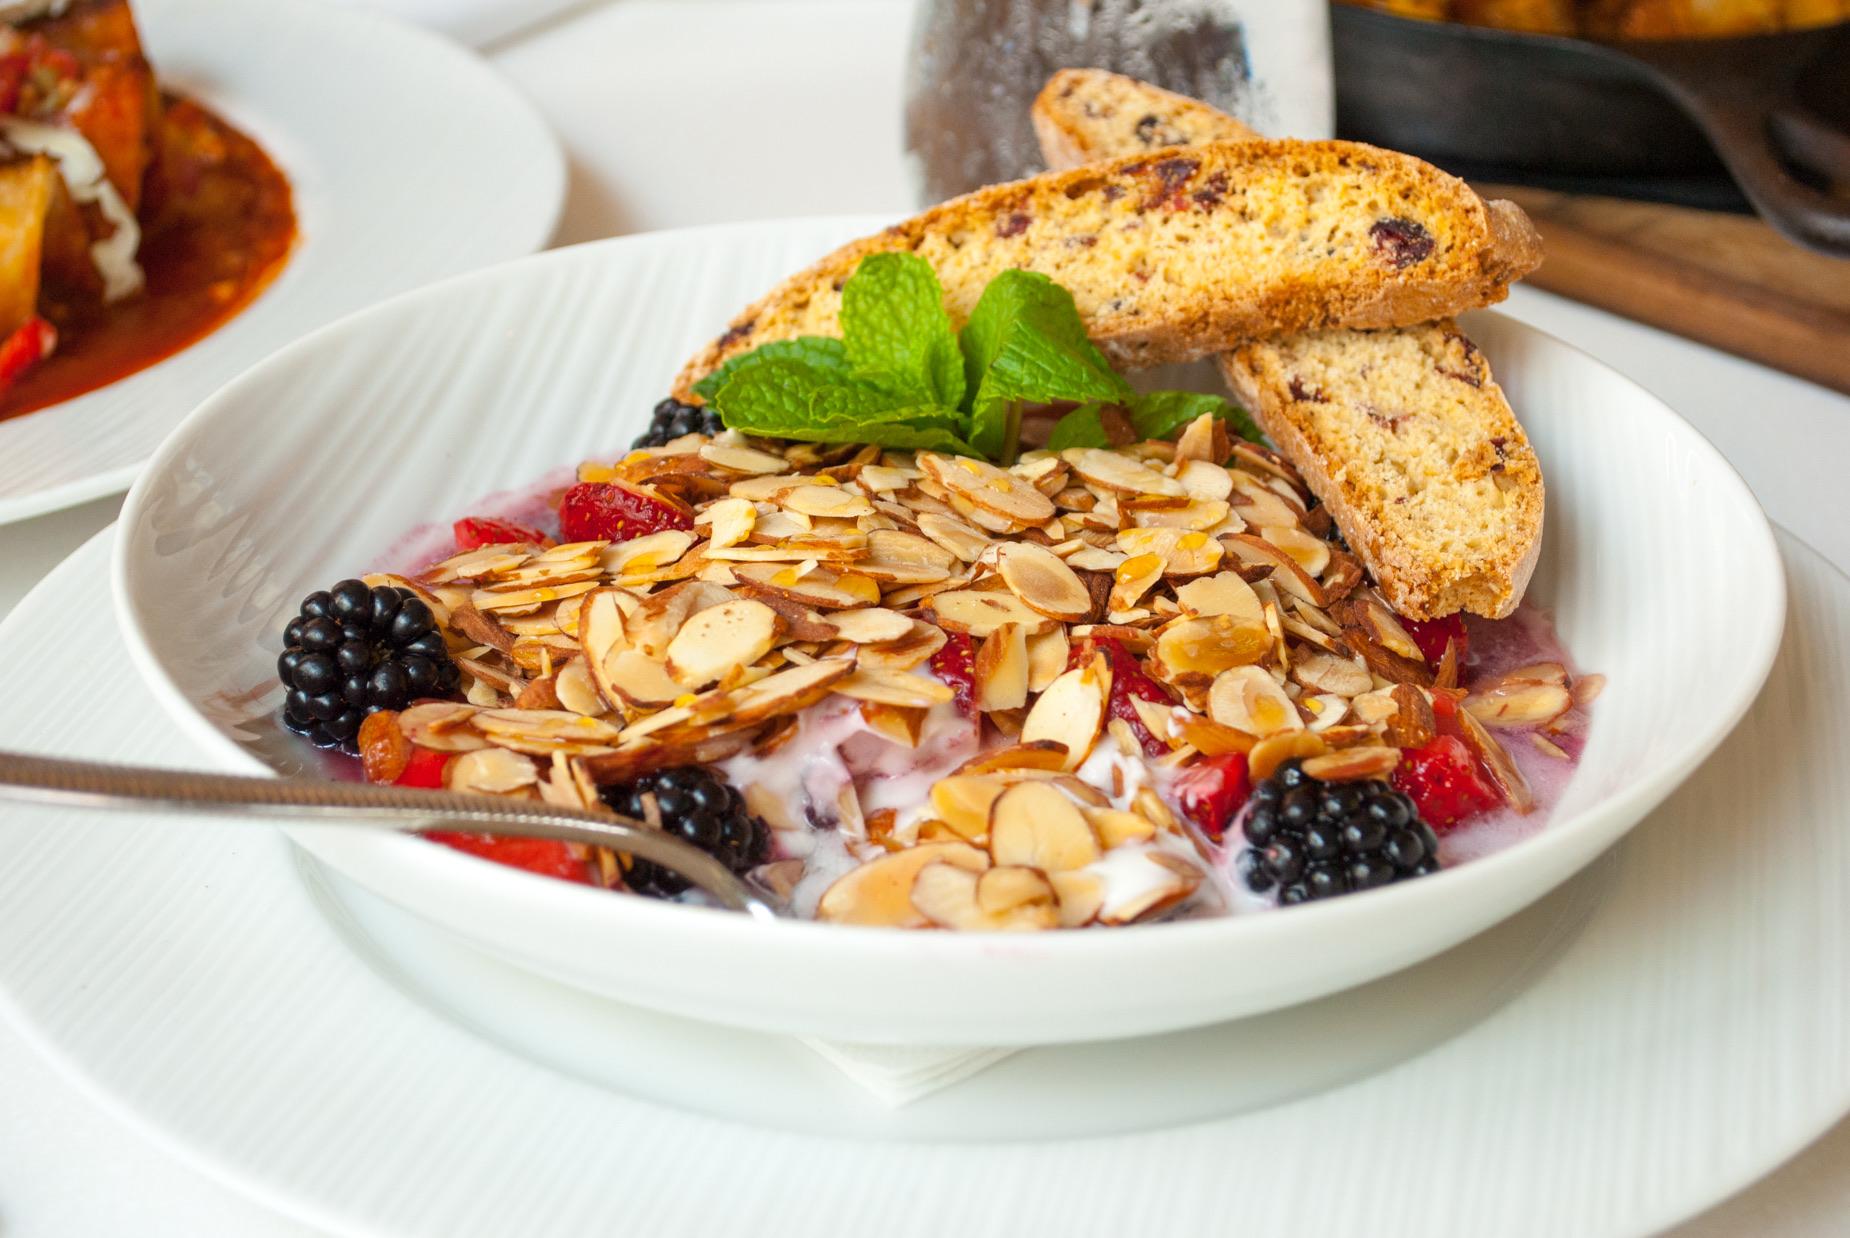 Greek Yogurt &Fresh Berries at Beachside Restaurant & Bar, Marina del Rey, CA